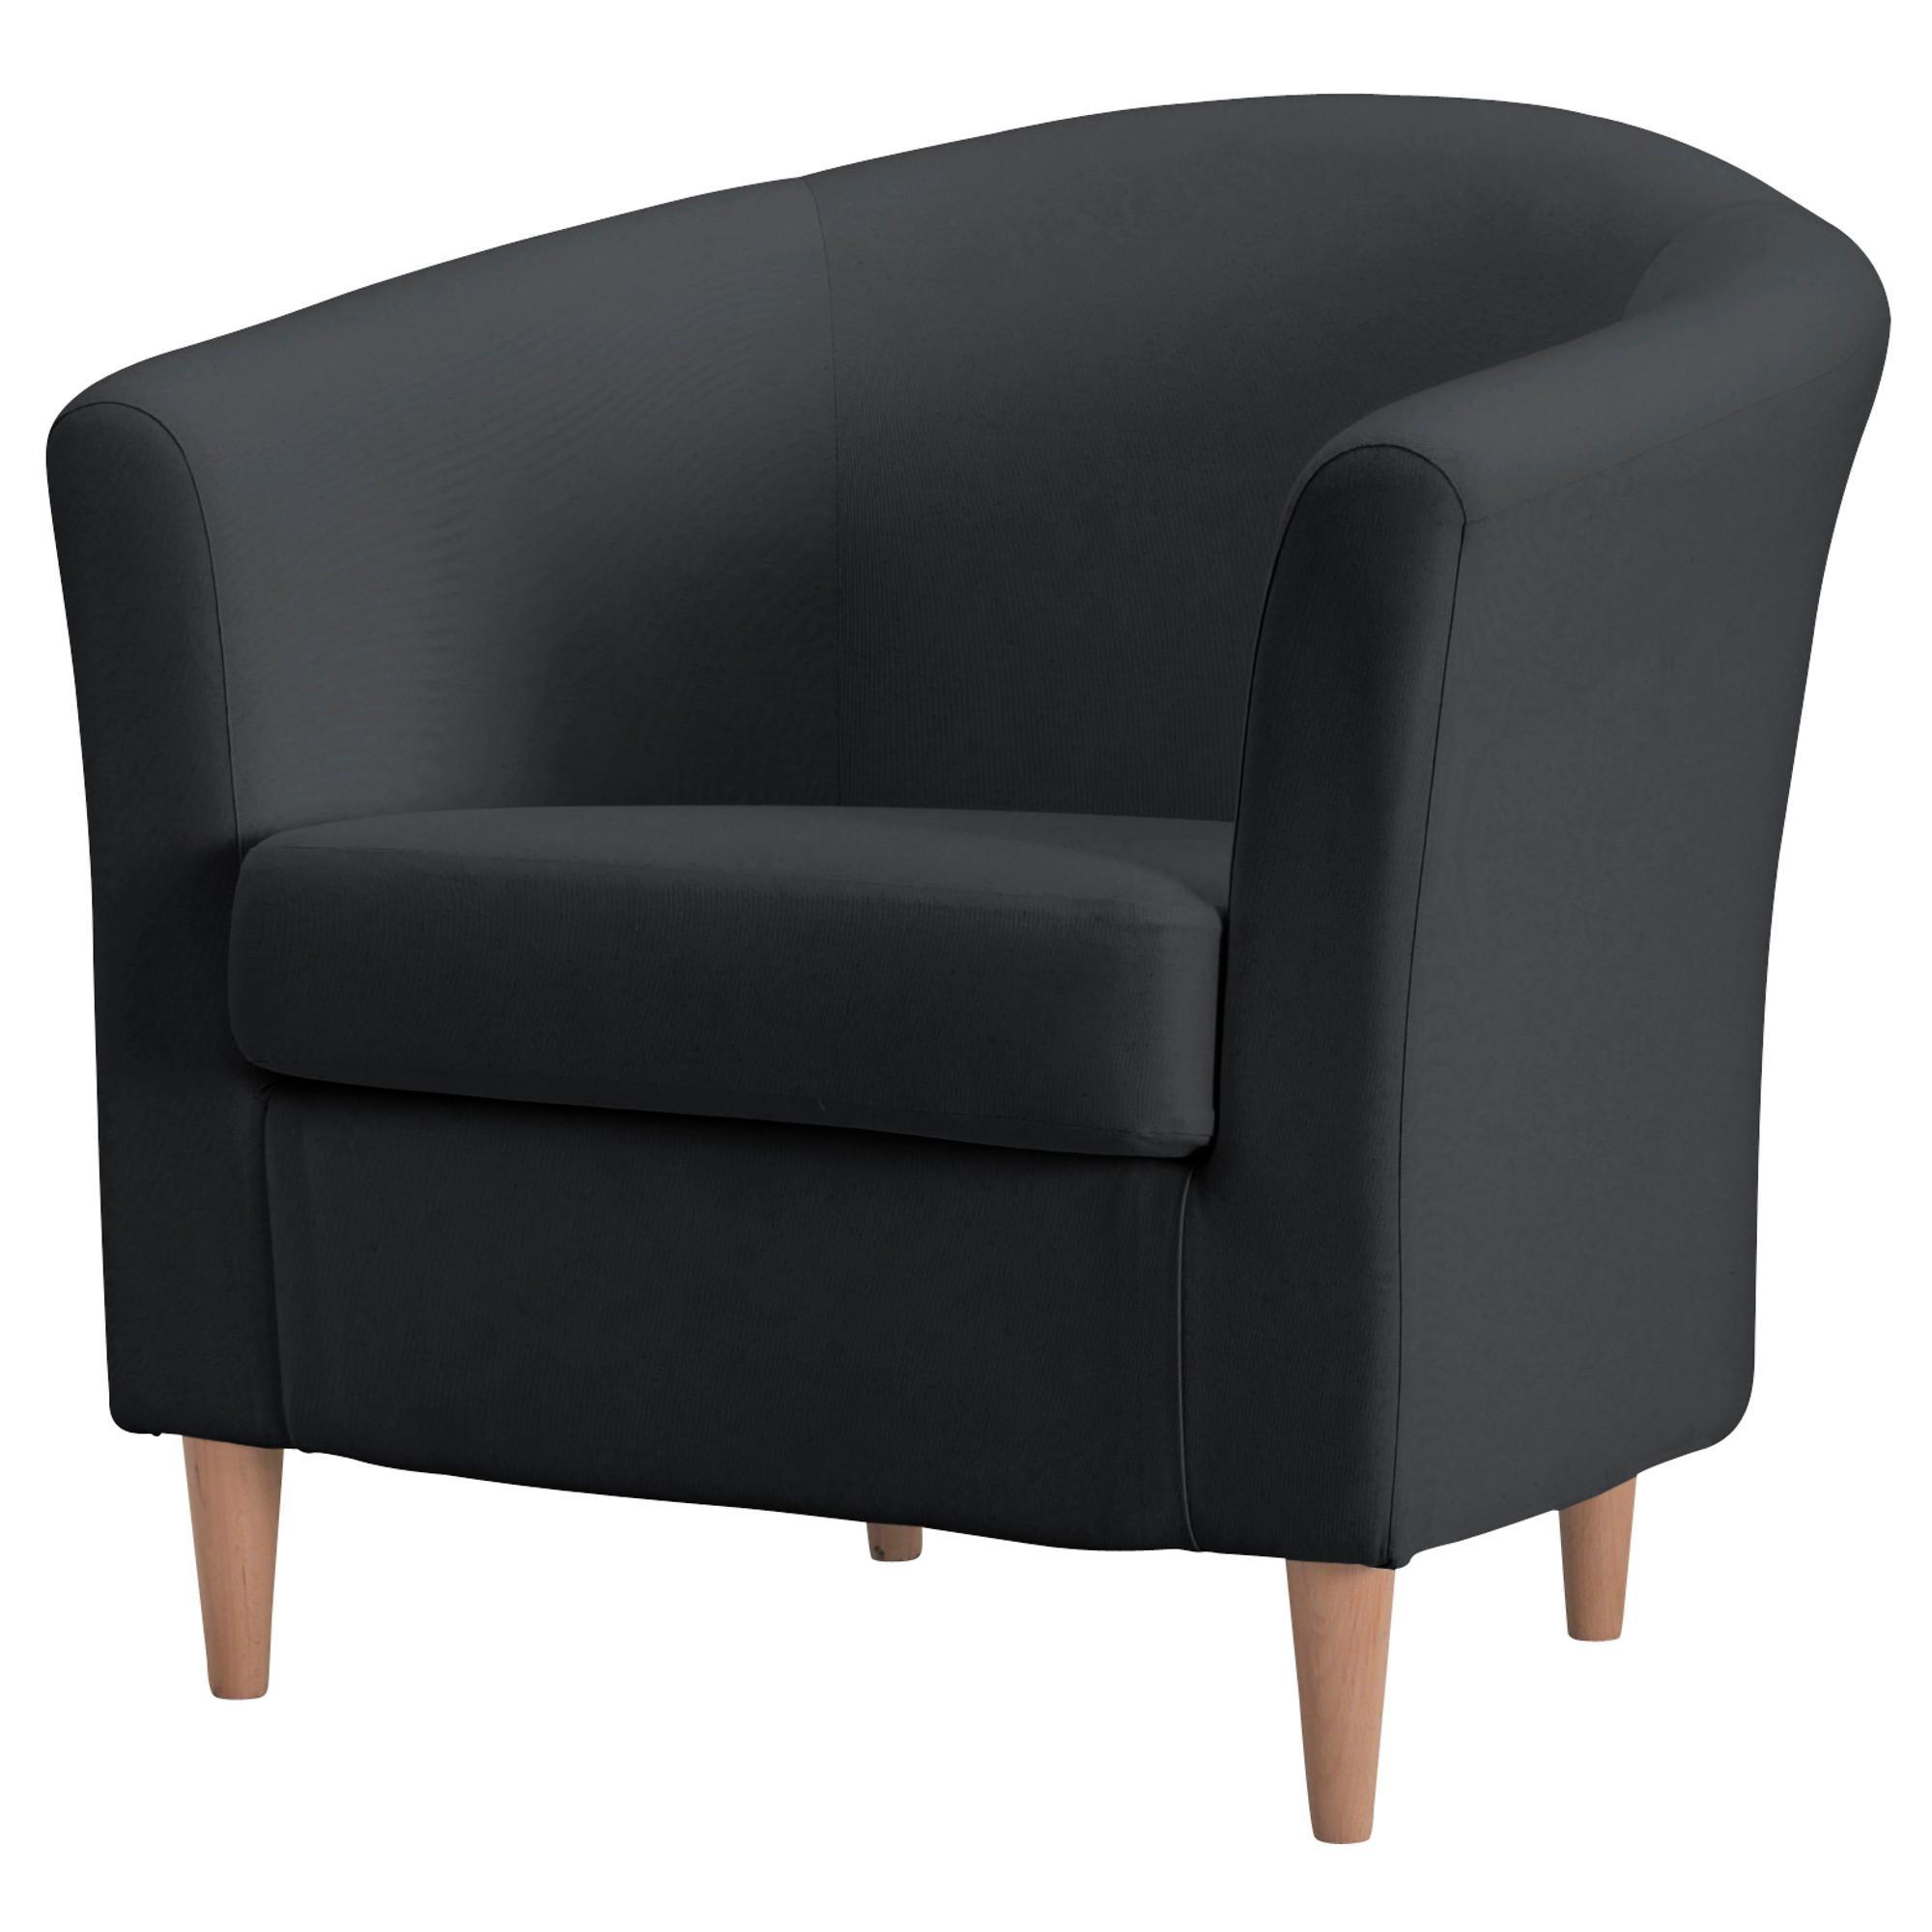 Sofa Chair Ikea | Tehranmix Decoration Within Sofa Chairs Ikea (View 8 of 20)